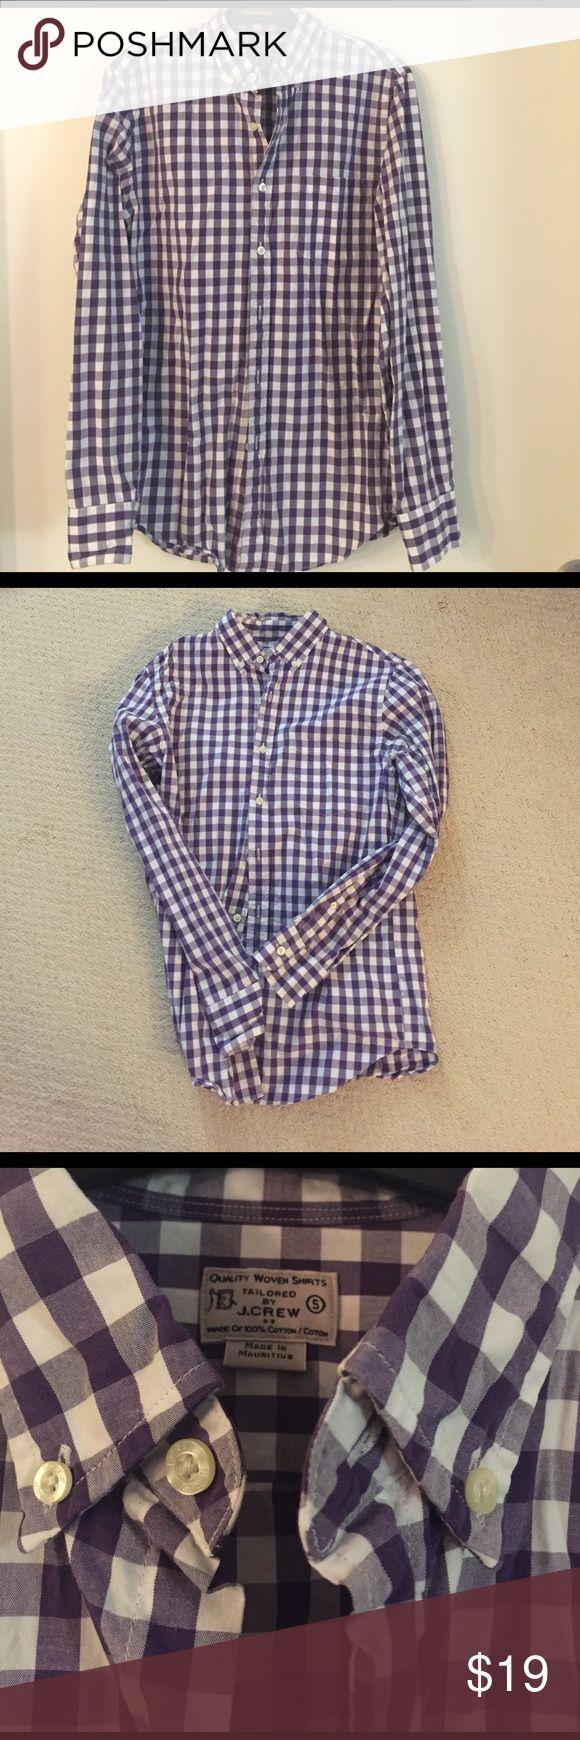 Men's JCrew button down, purple and white Small Men's Small JCREW casual button down. Purple and white plaid. Excellent condition! J. Crew Shirts Casual Button Down Shirts